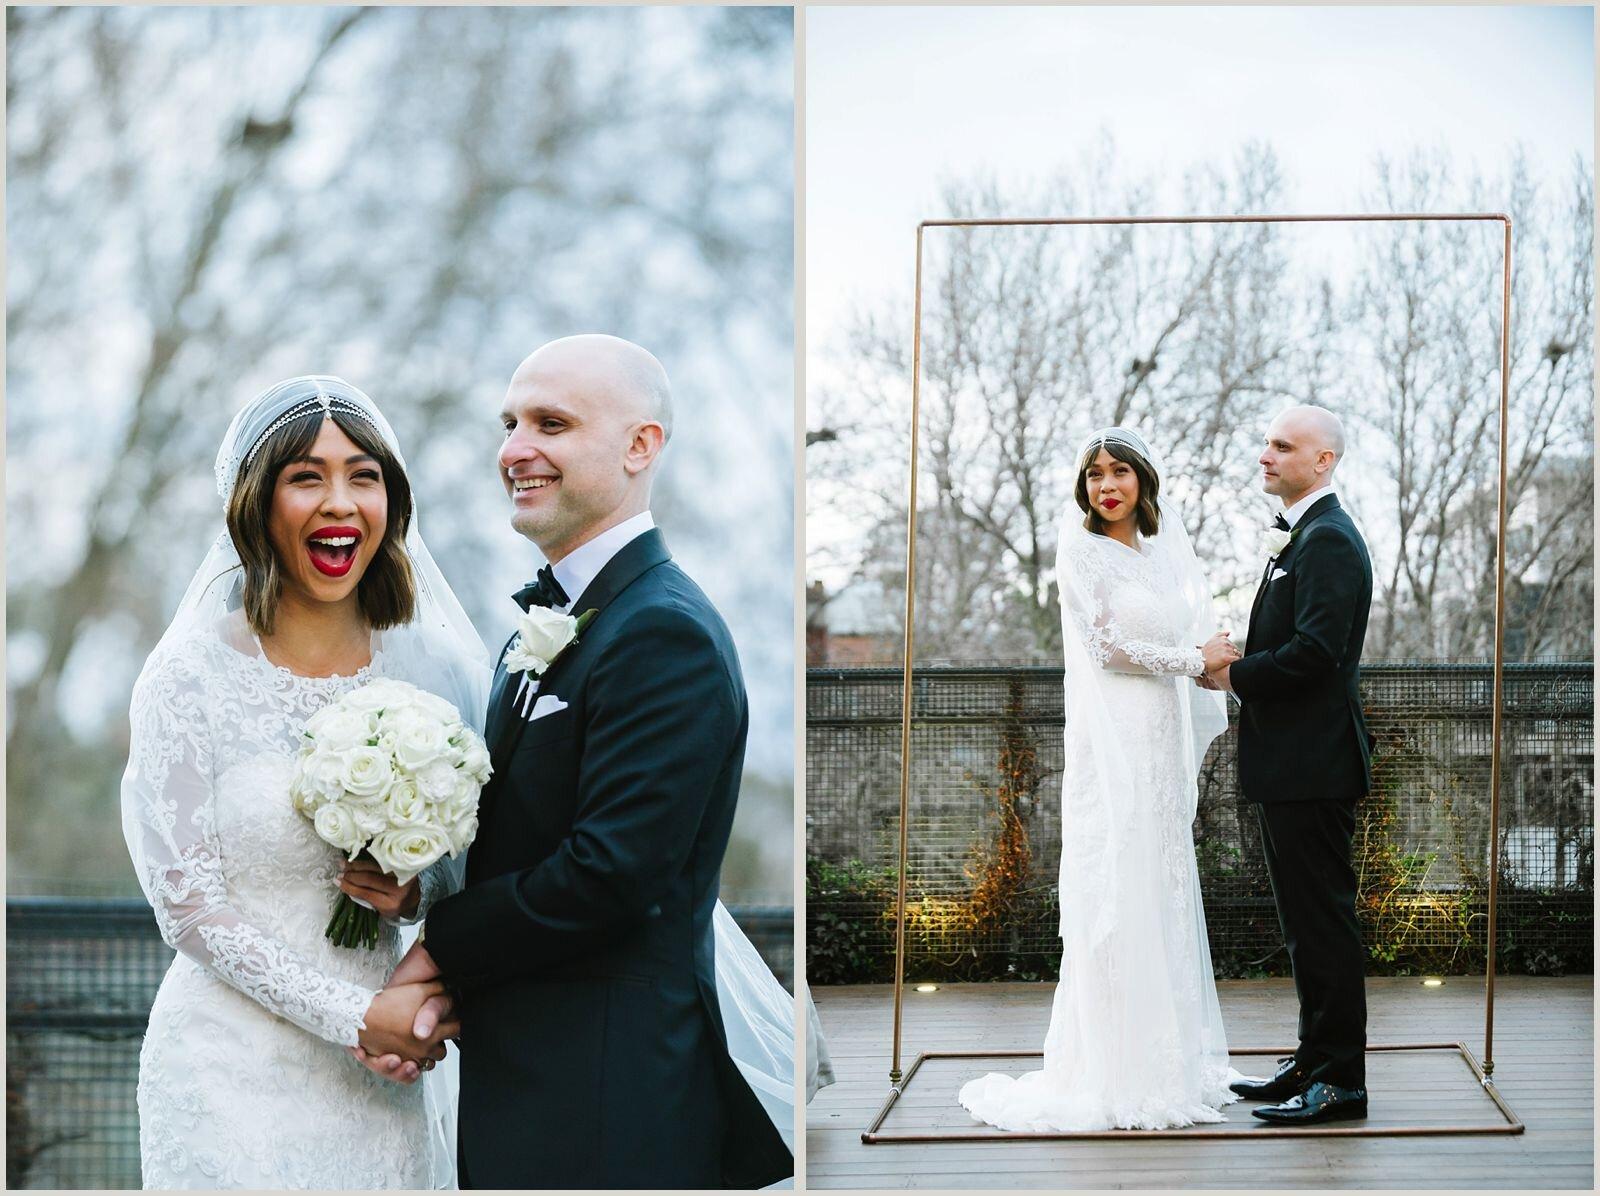 joseph_koprek_wedding_melbourne_the_prince_deck_0062.jpg